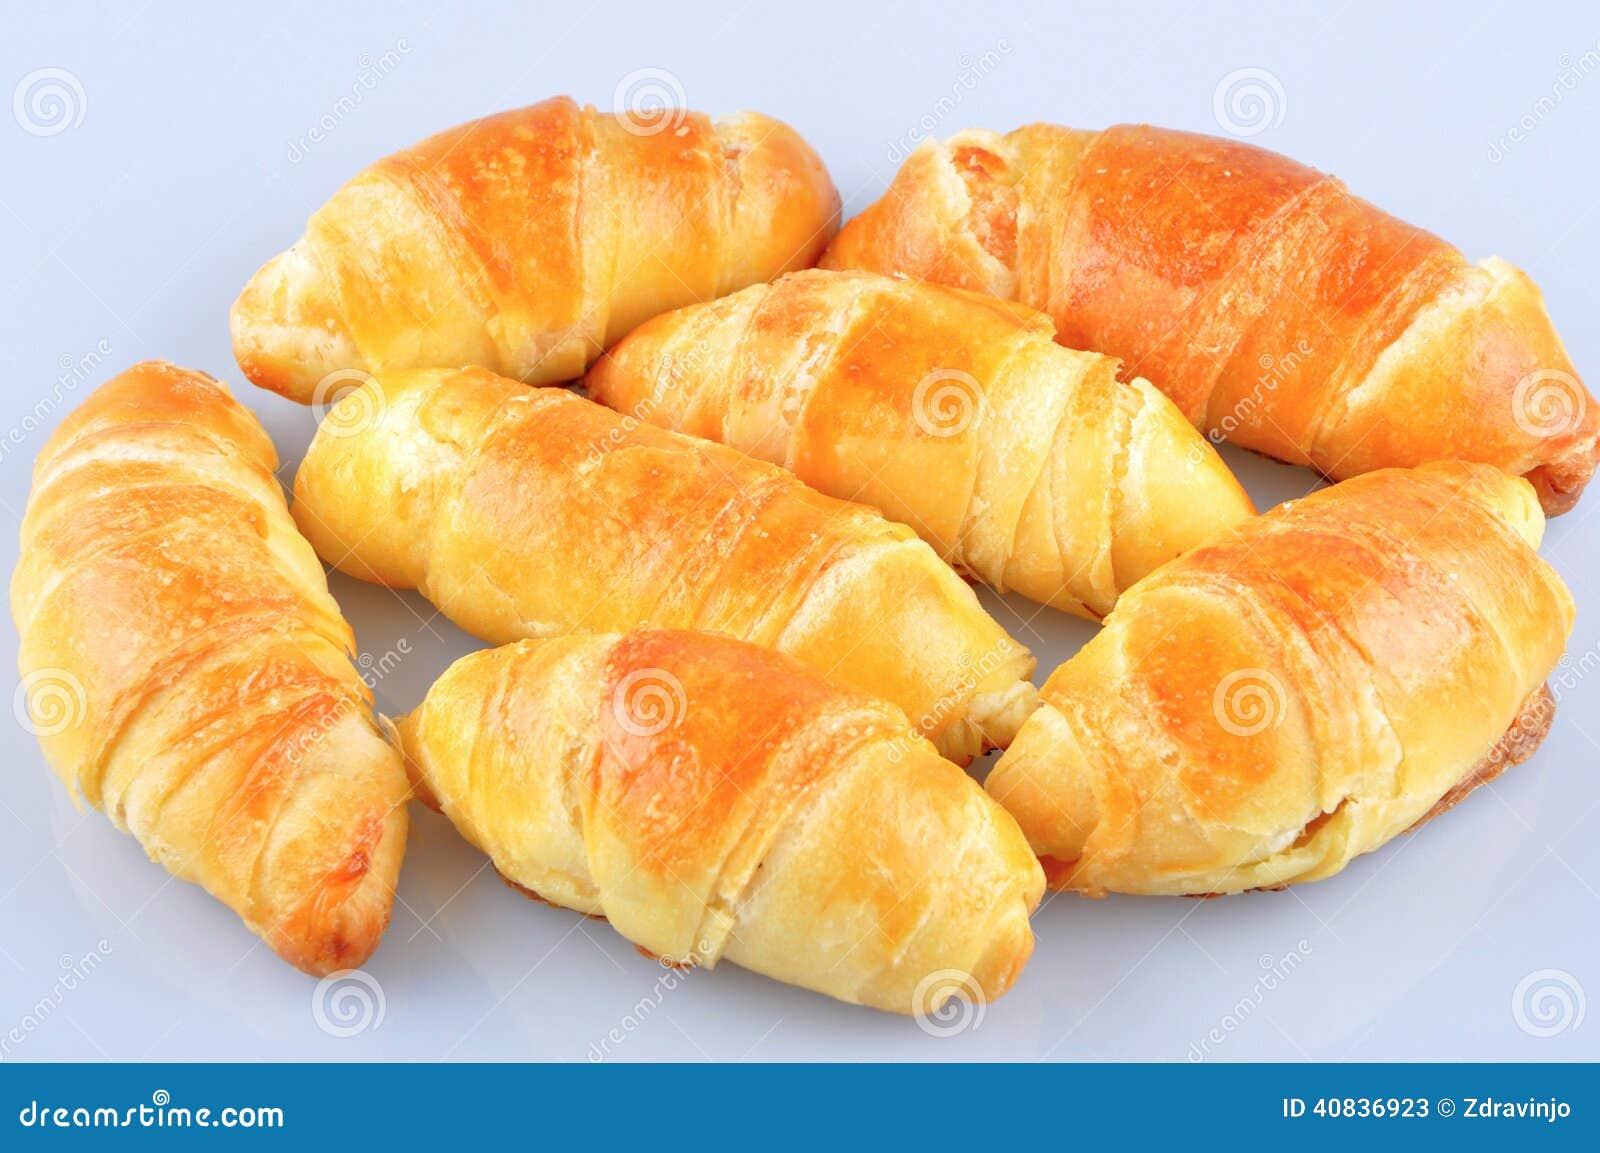 Homemade pastry